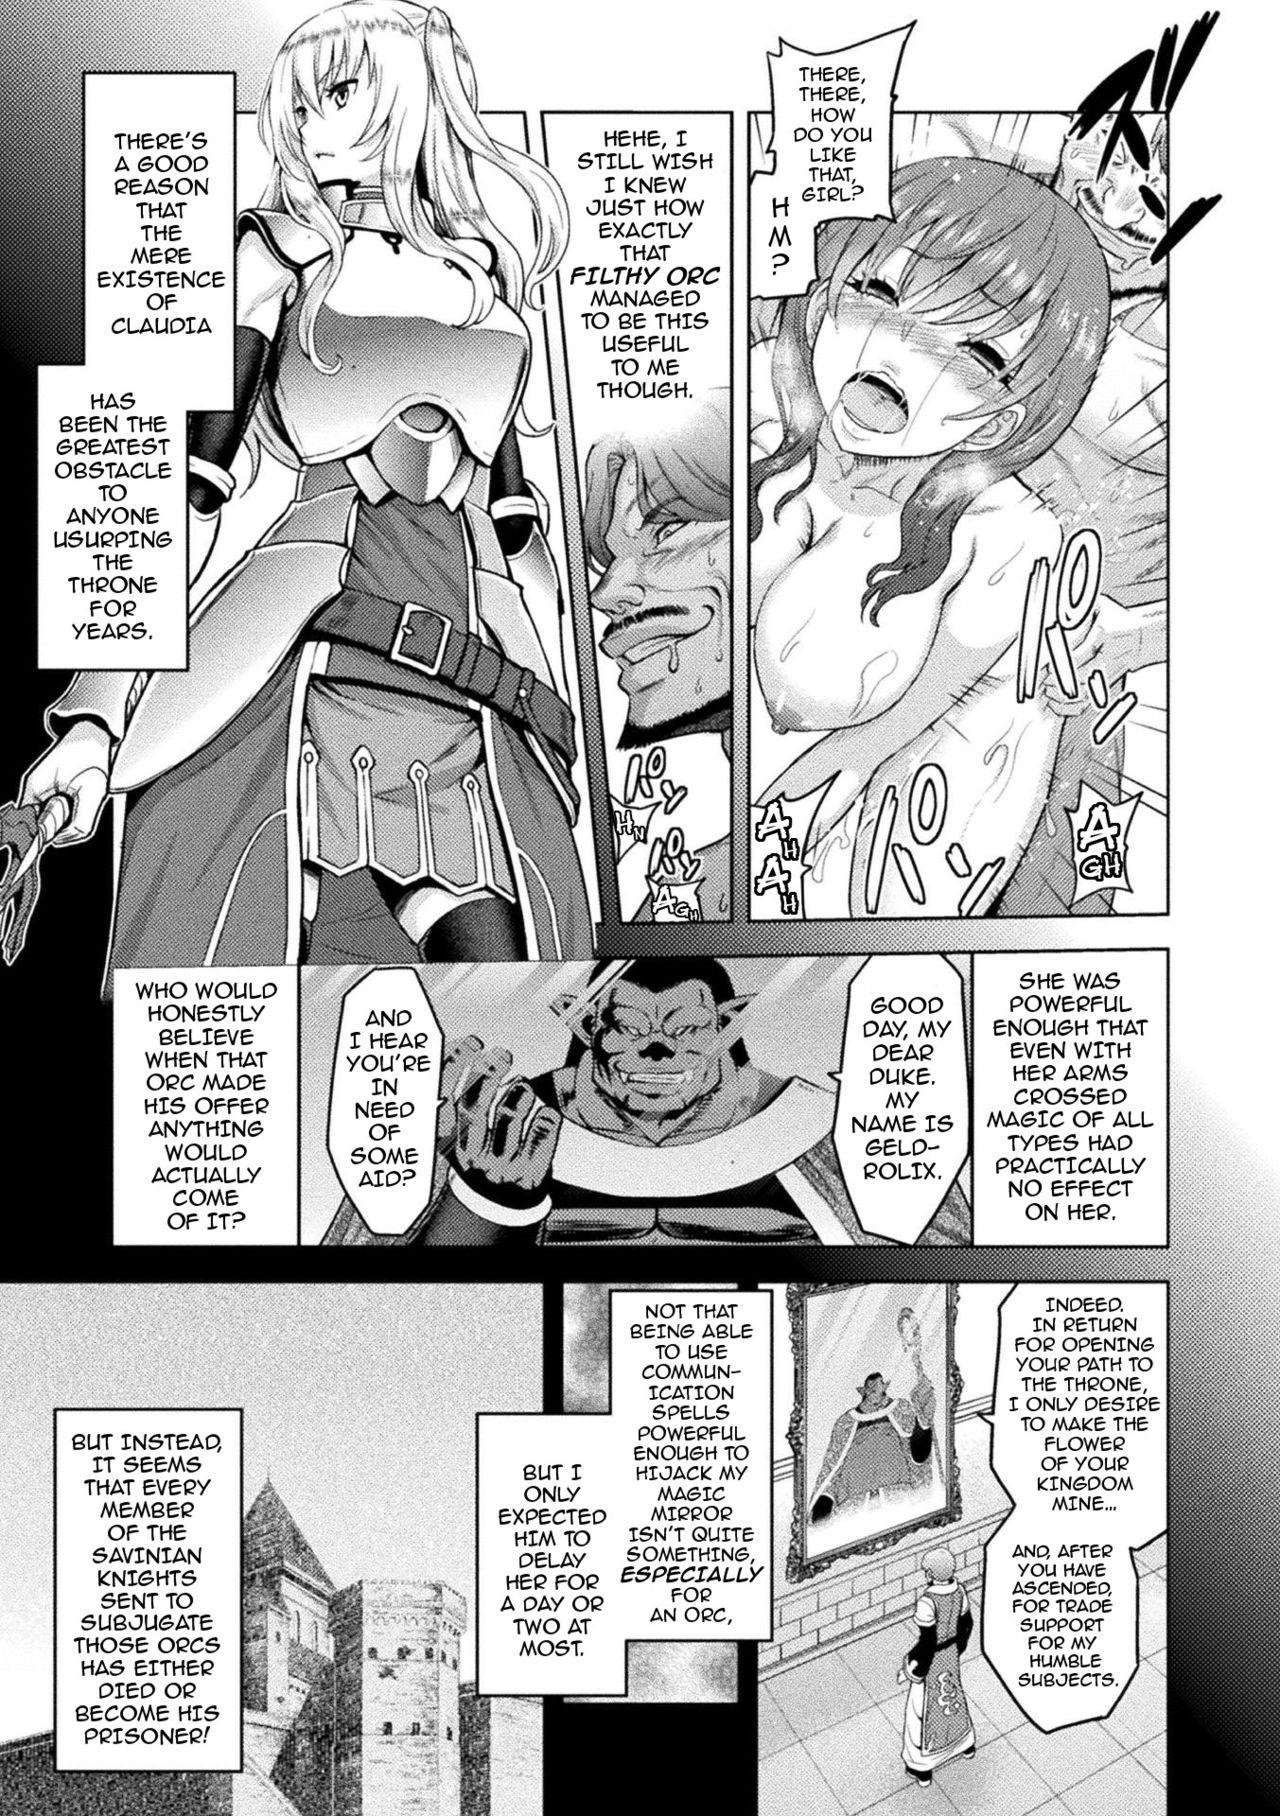 [Yamada Gogogo] Erona ~Orc no Inmon ni Okasareta Onna Kishi no Matsuro~   Erona ~The Fall of a Beautiful Knight Cursed with the Lewd Mark of an Orc~ Ch. 1-6 [English] {darknight} 77